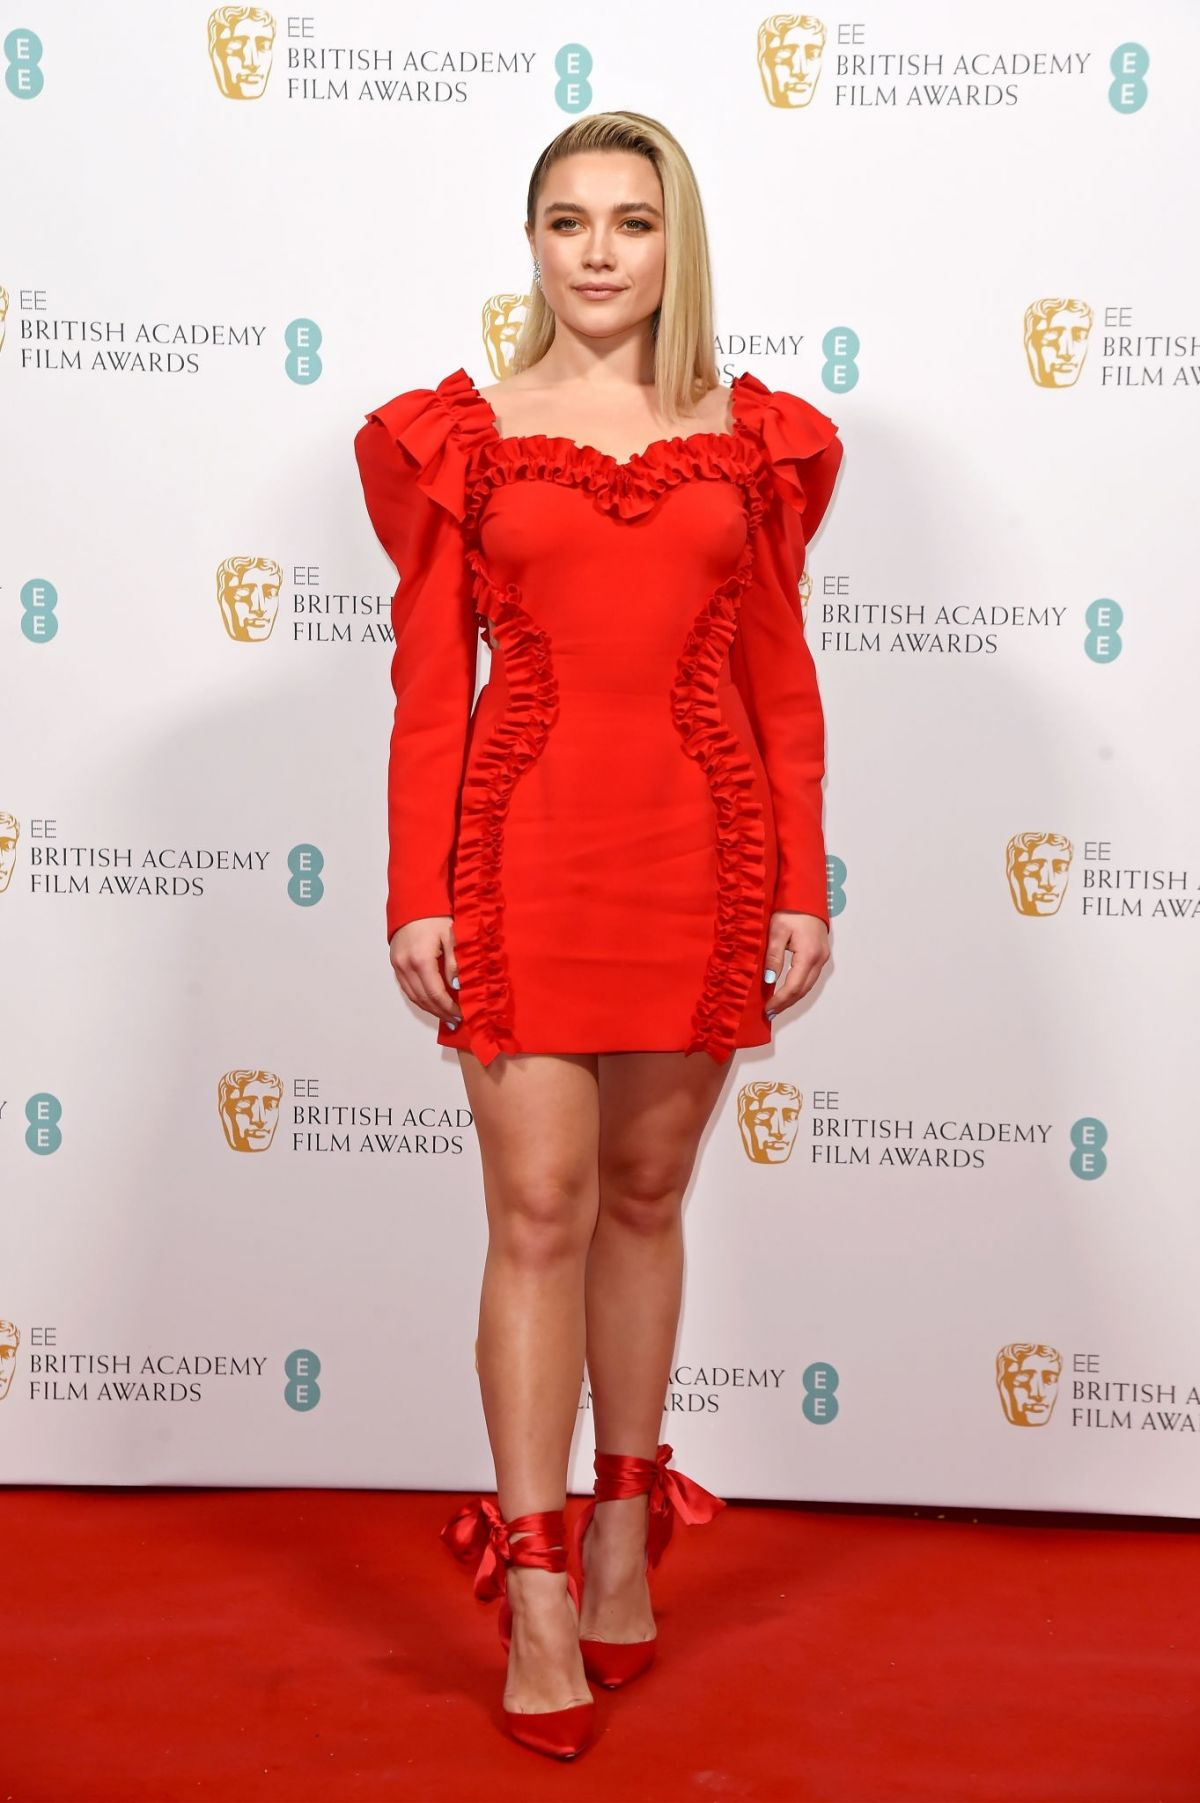 FLORENCE PUGH at EE British Academy Film Awards 2020